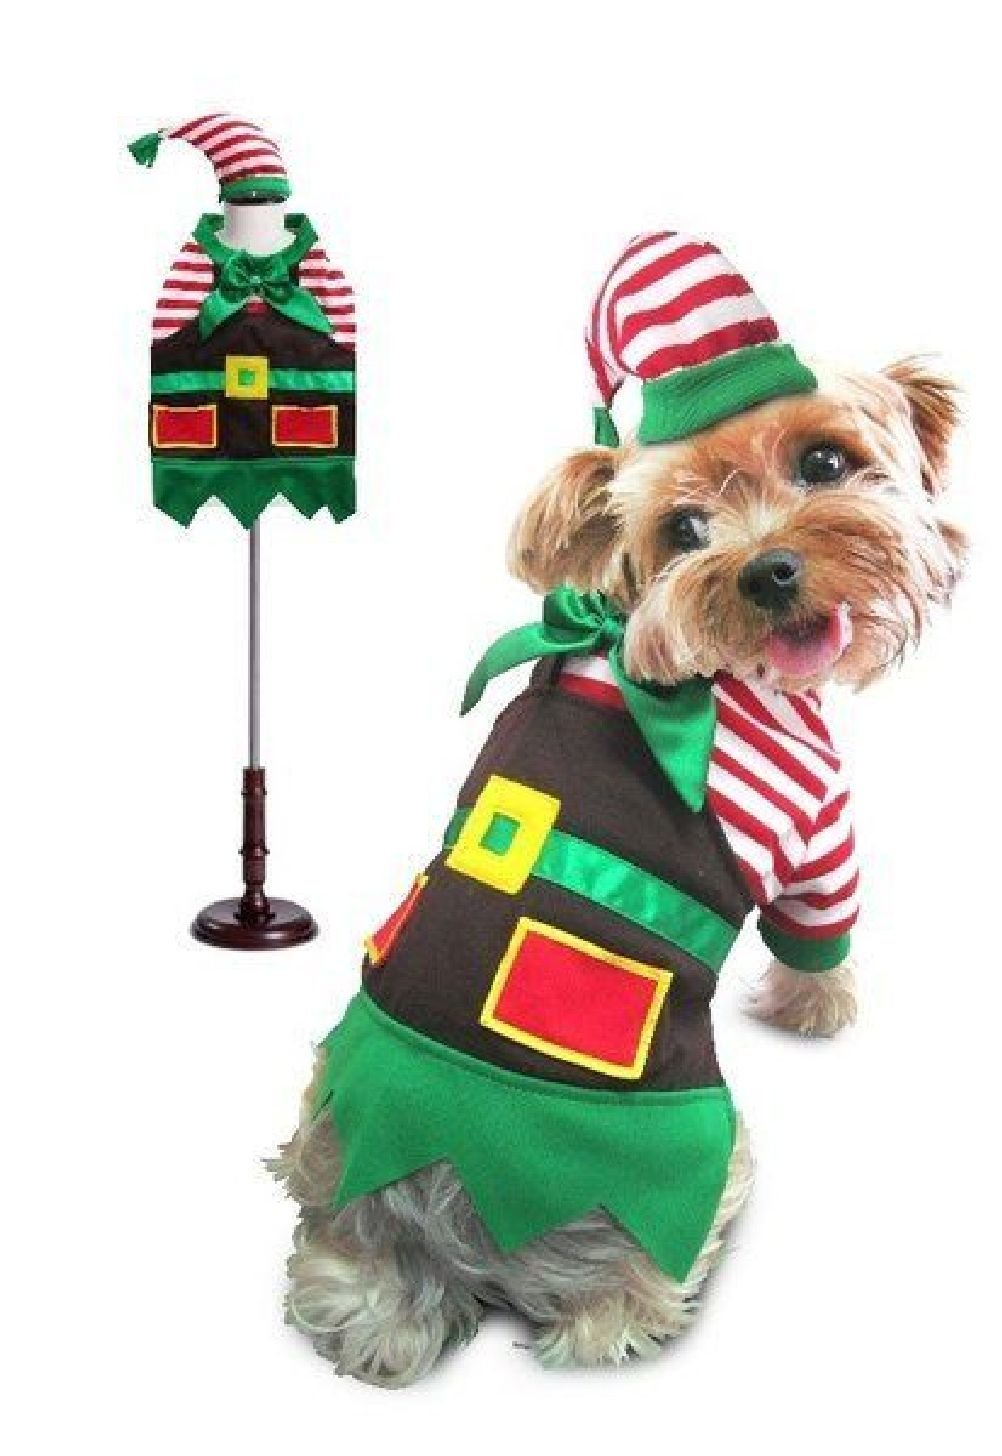 Santa'S Elf Christmas Holiday Theme Dog Costume Stripe Shirt Apron Matching Hat